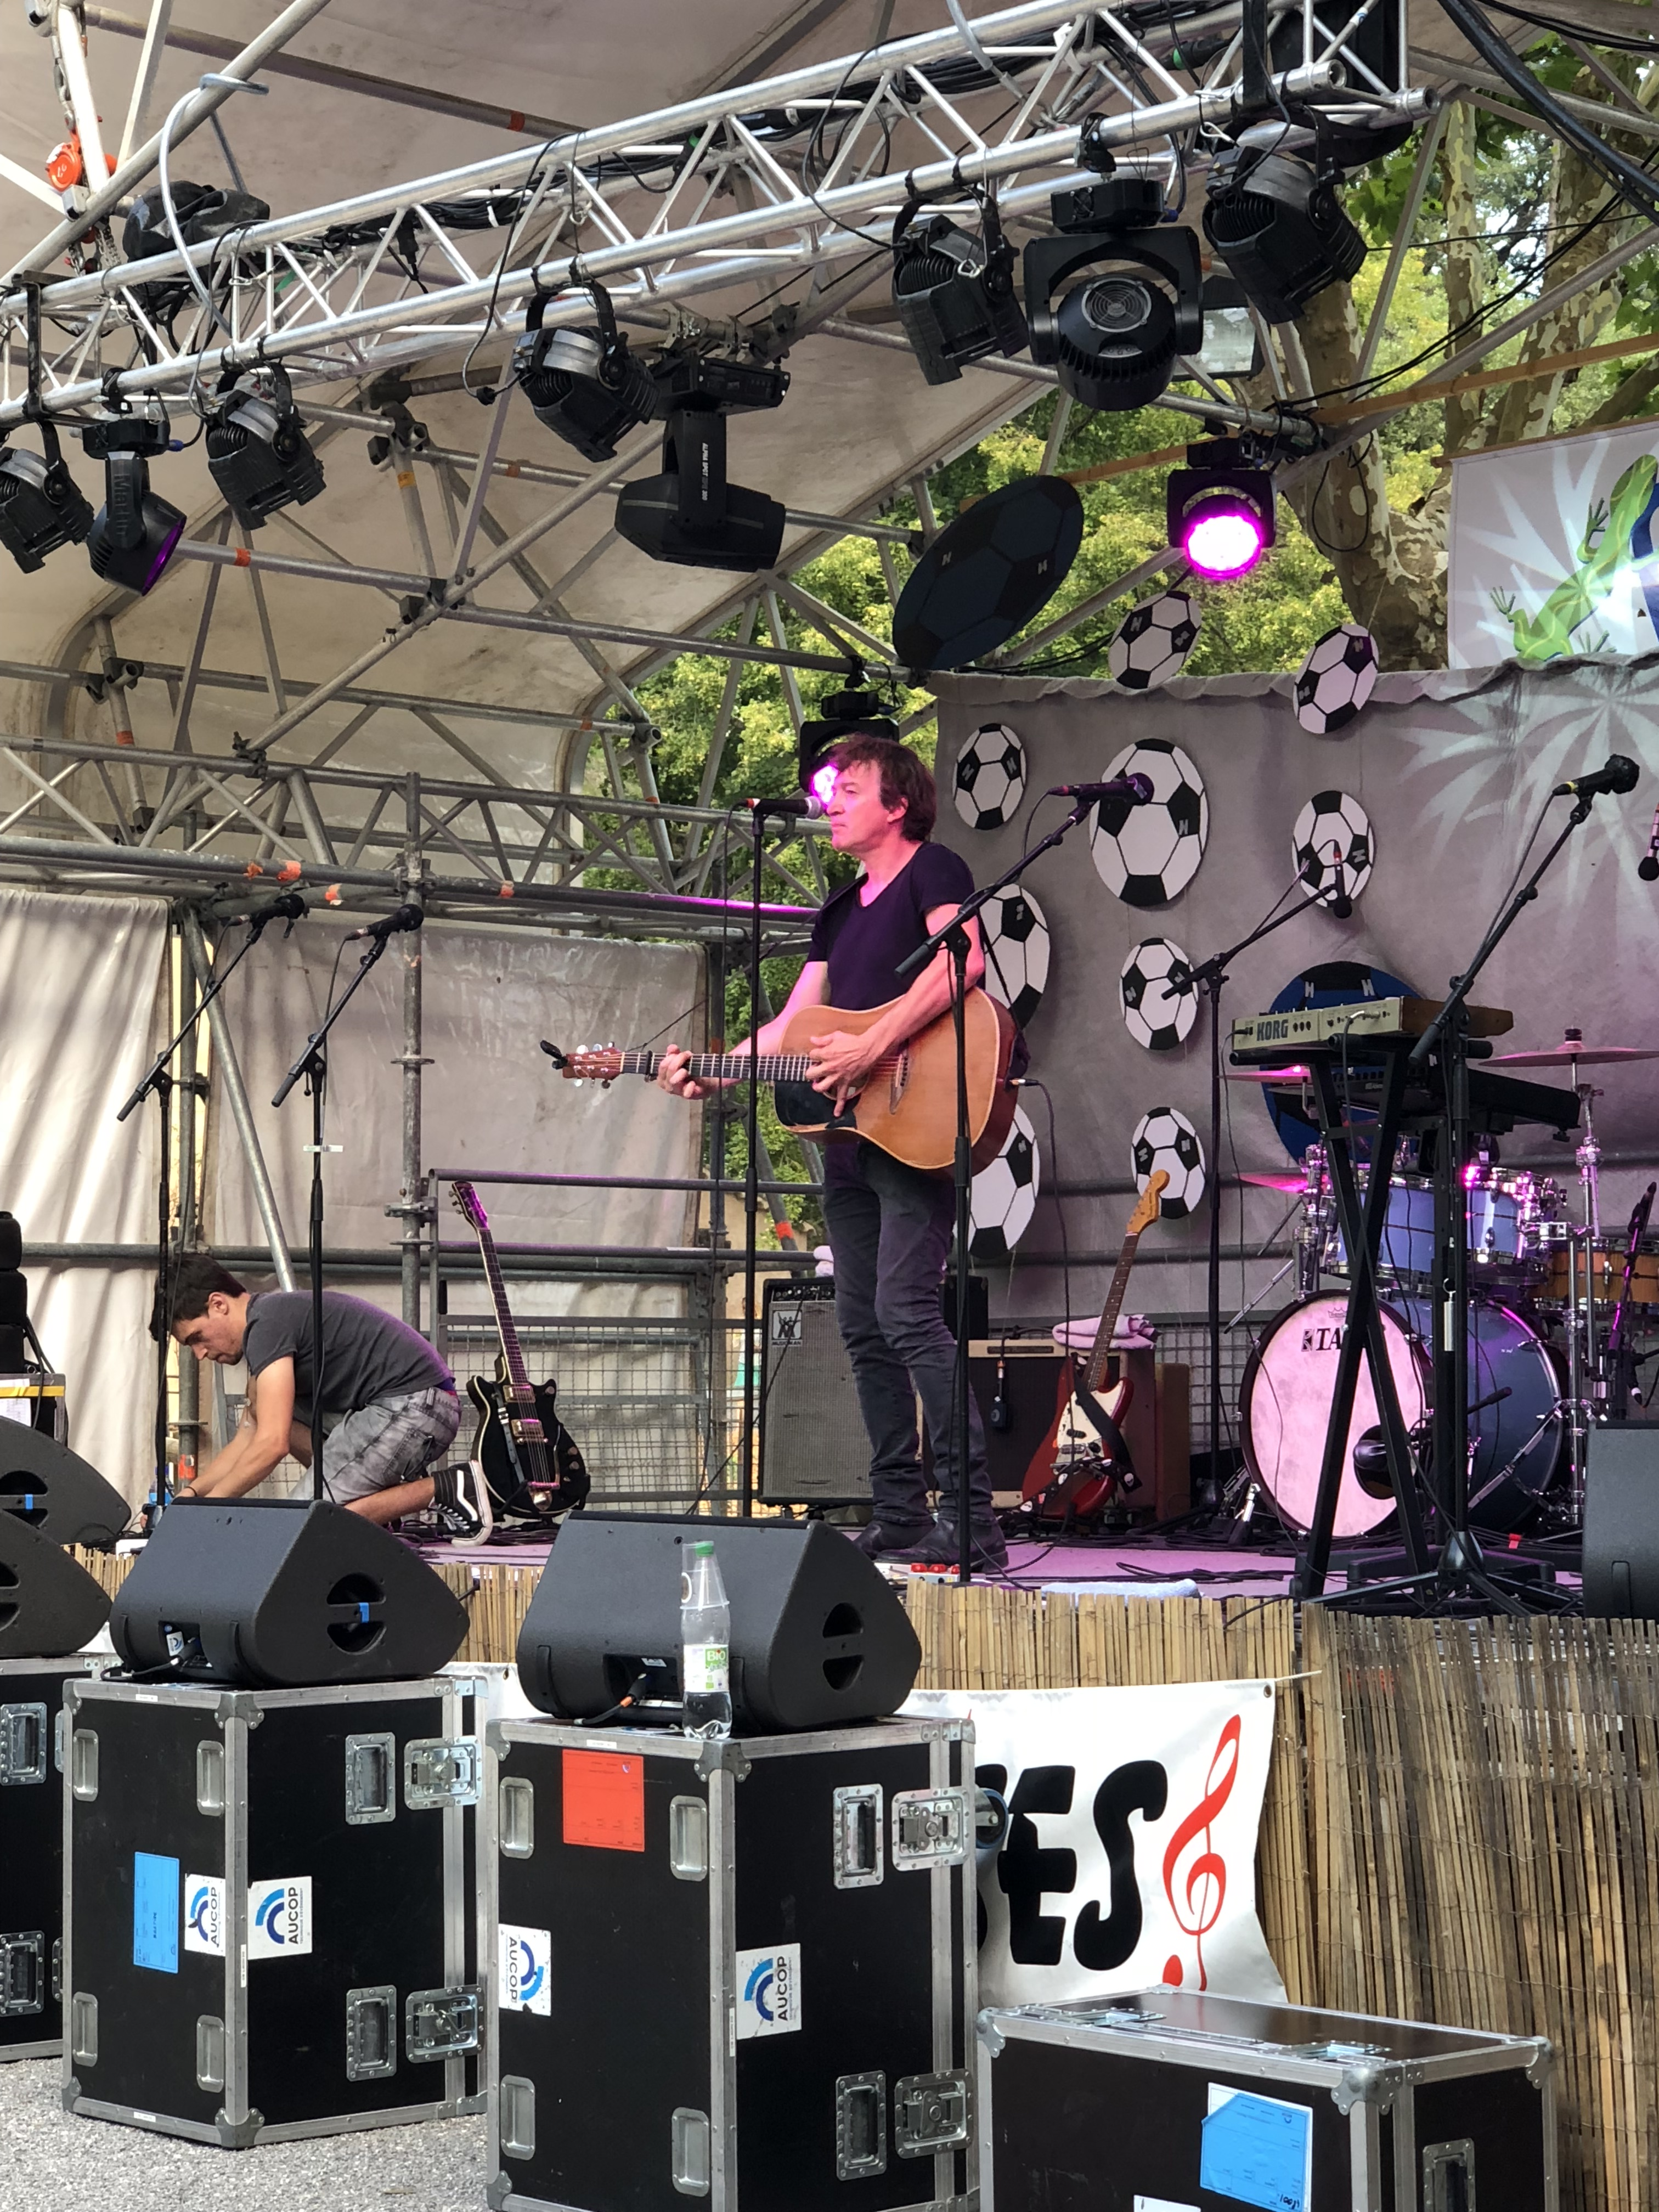 aucop-event-festival-festival en sausses-sonorisation-eclairage-cali-kolinka-dahan-scene-audiovisuel-evenementiel-alpes de haute provence-carros-console-yamaha-oxo-projecteurs-musiciens